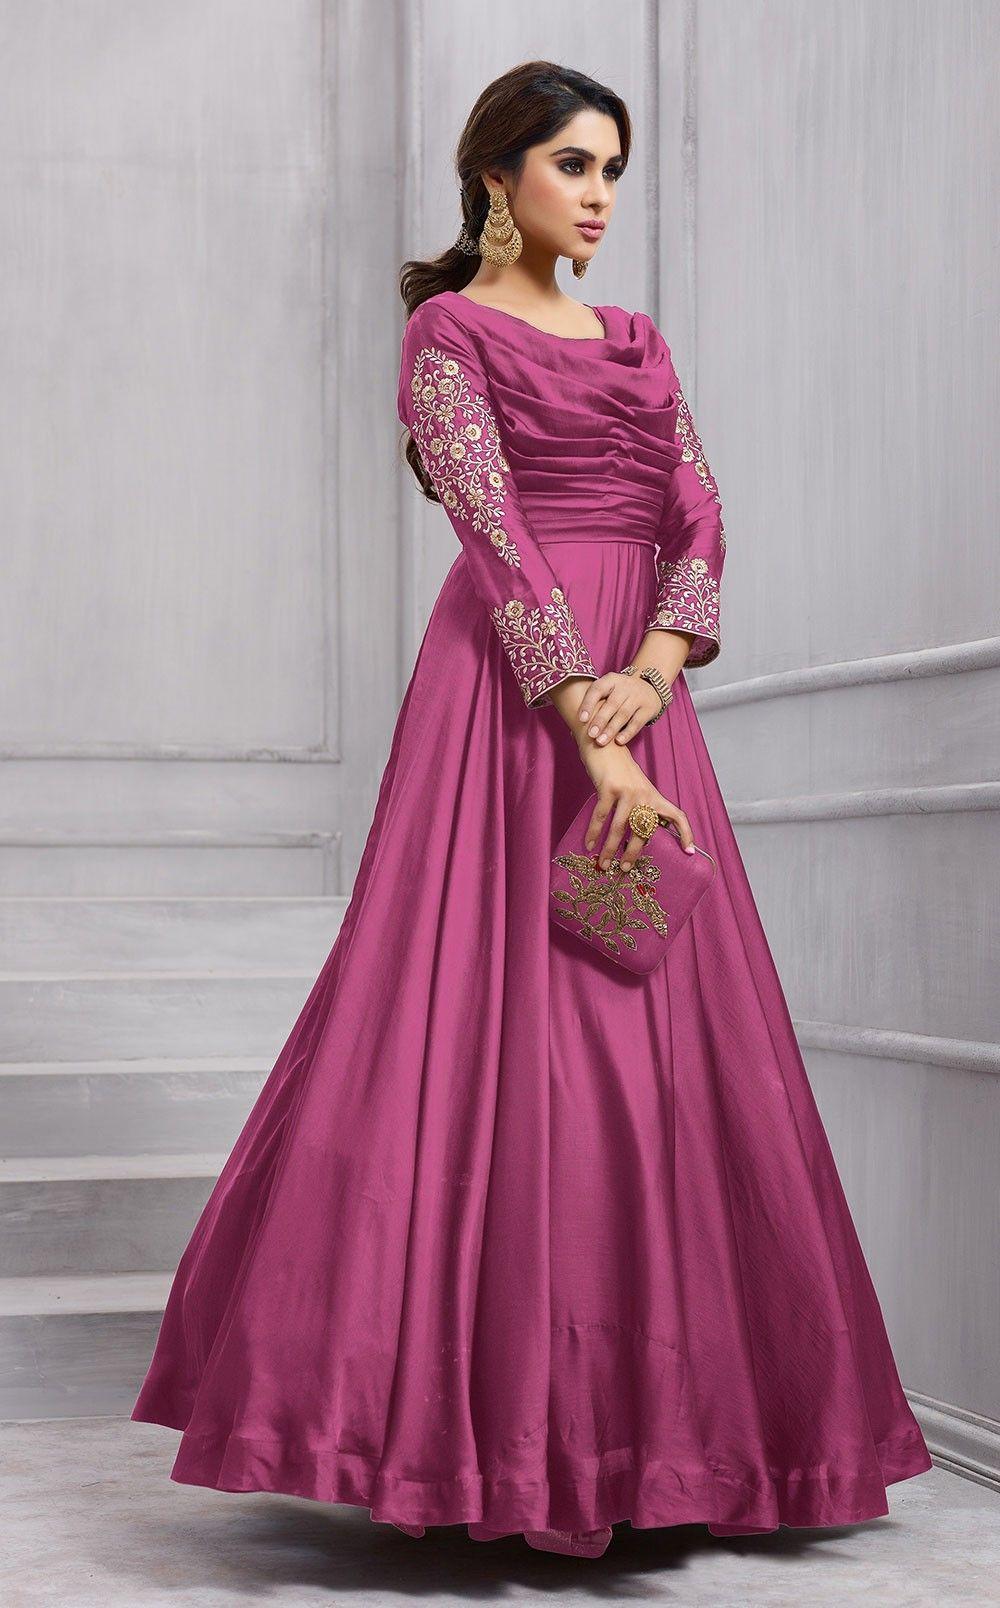 5697512f79 Baby Pink indo western designer evening party wear gown in net ...